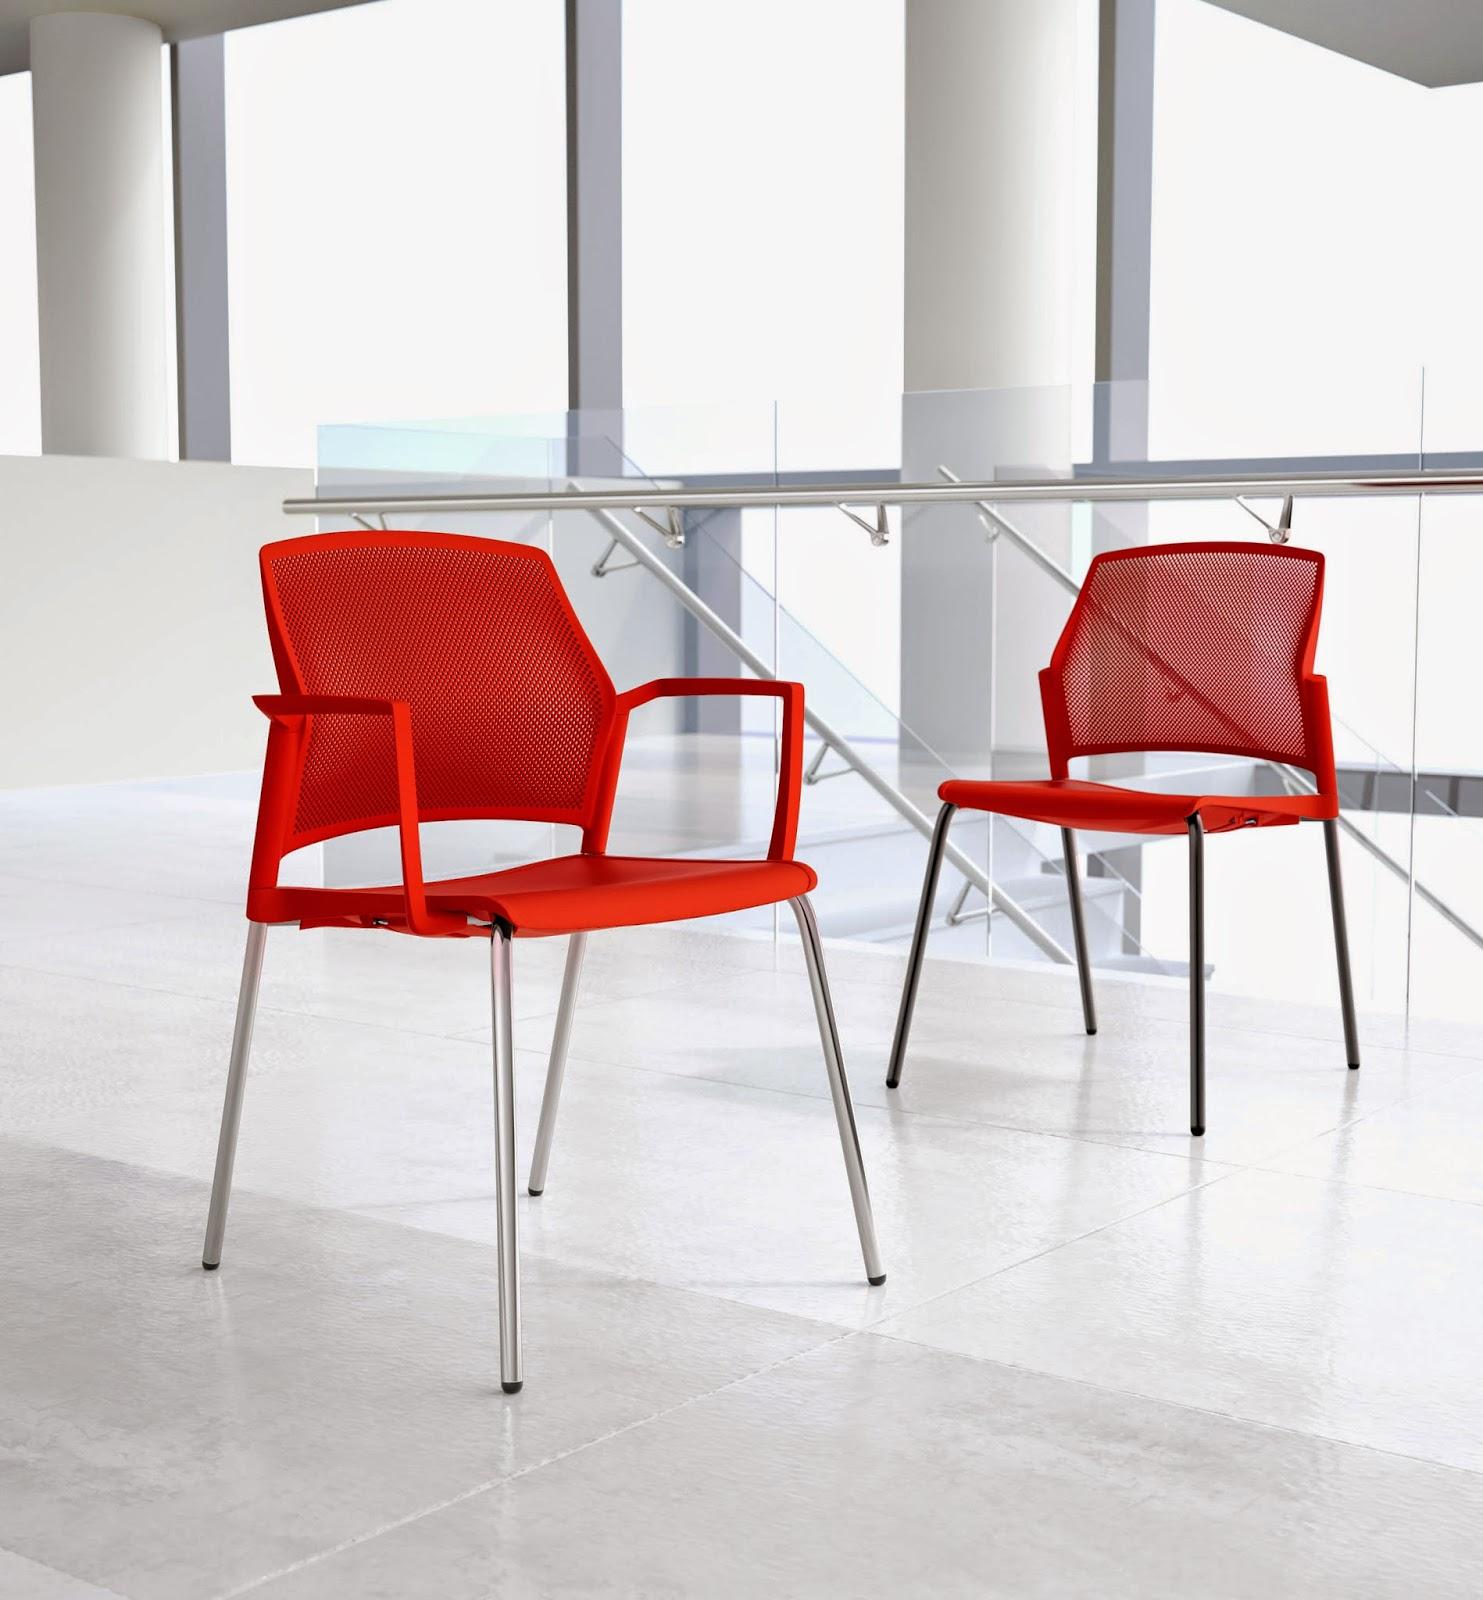 Oficina total mayo 2014 for Exposicion muebles barcelona